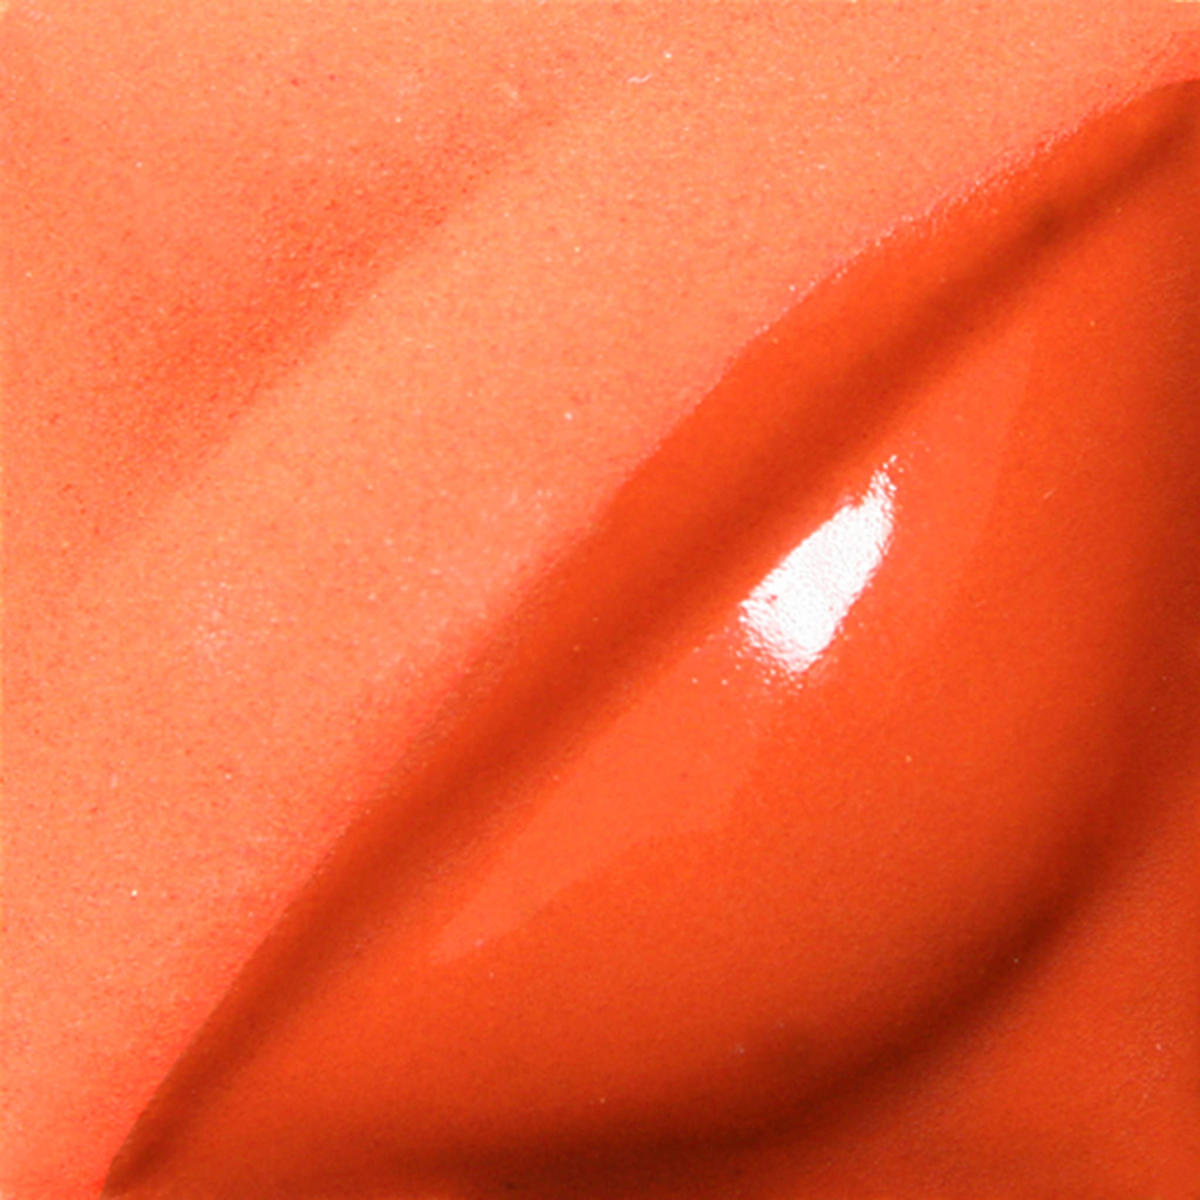 venta de esmalte para cerámica amaco velvet V-389 flame orange bajo esmalte